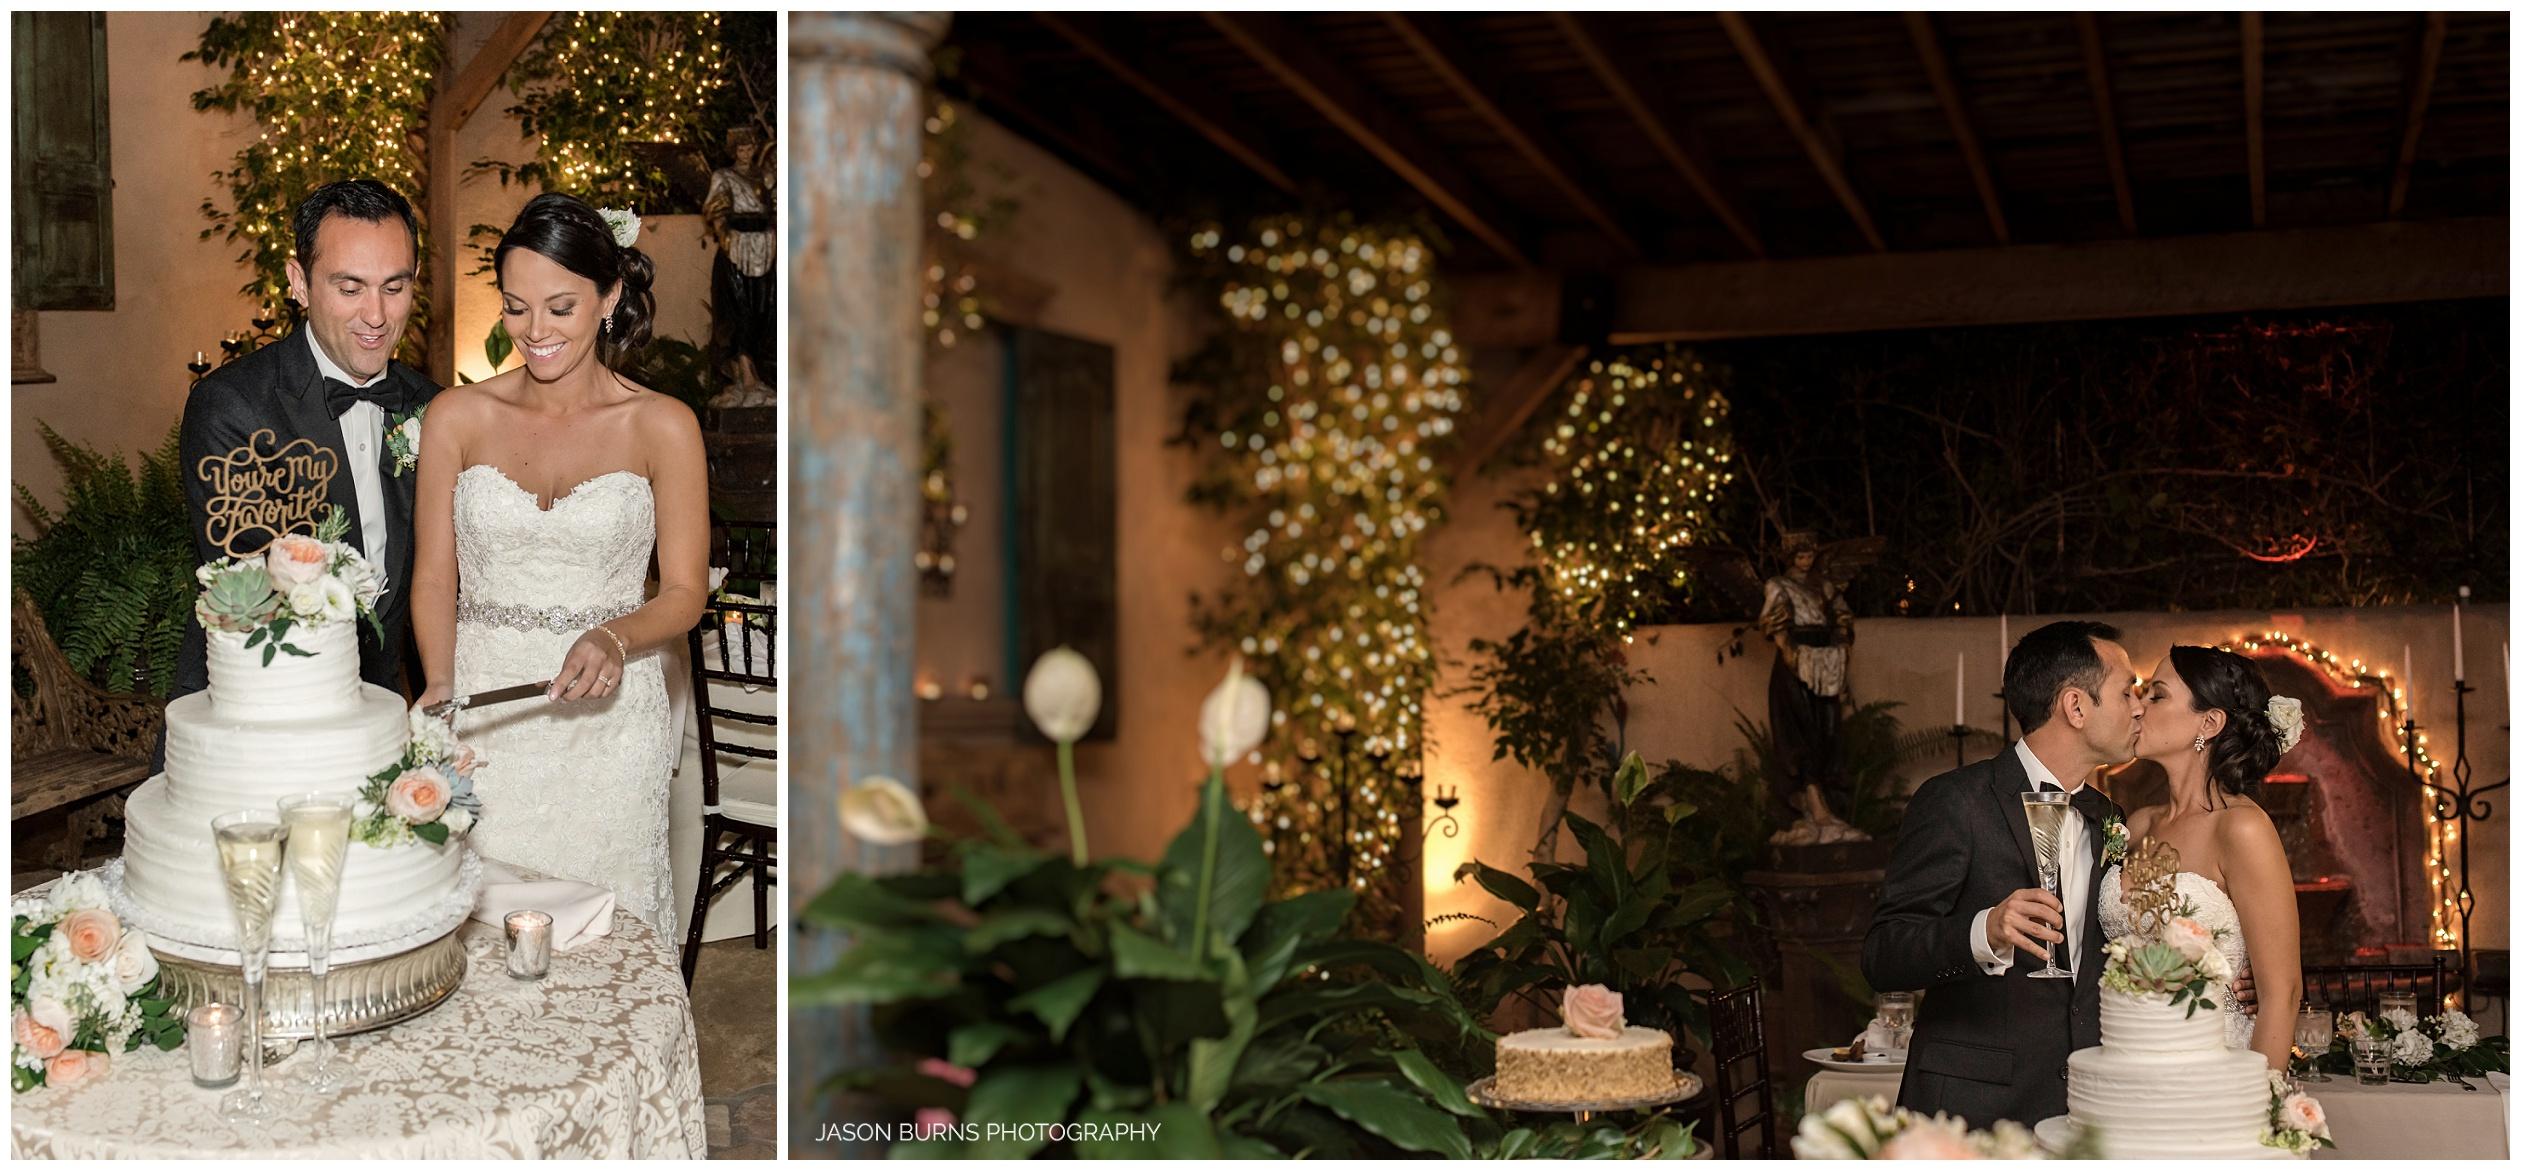 Bride and Groom cake cutting at the Hacienda Weddings Santa Ana